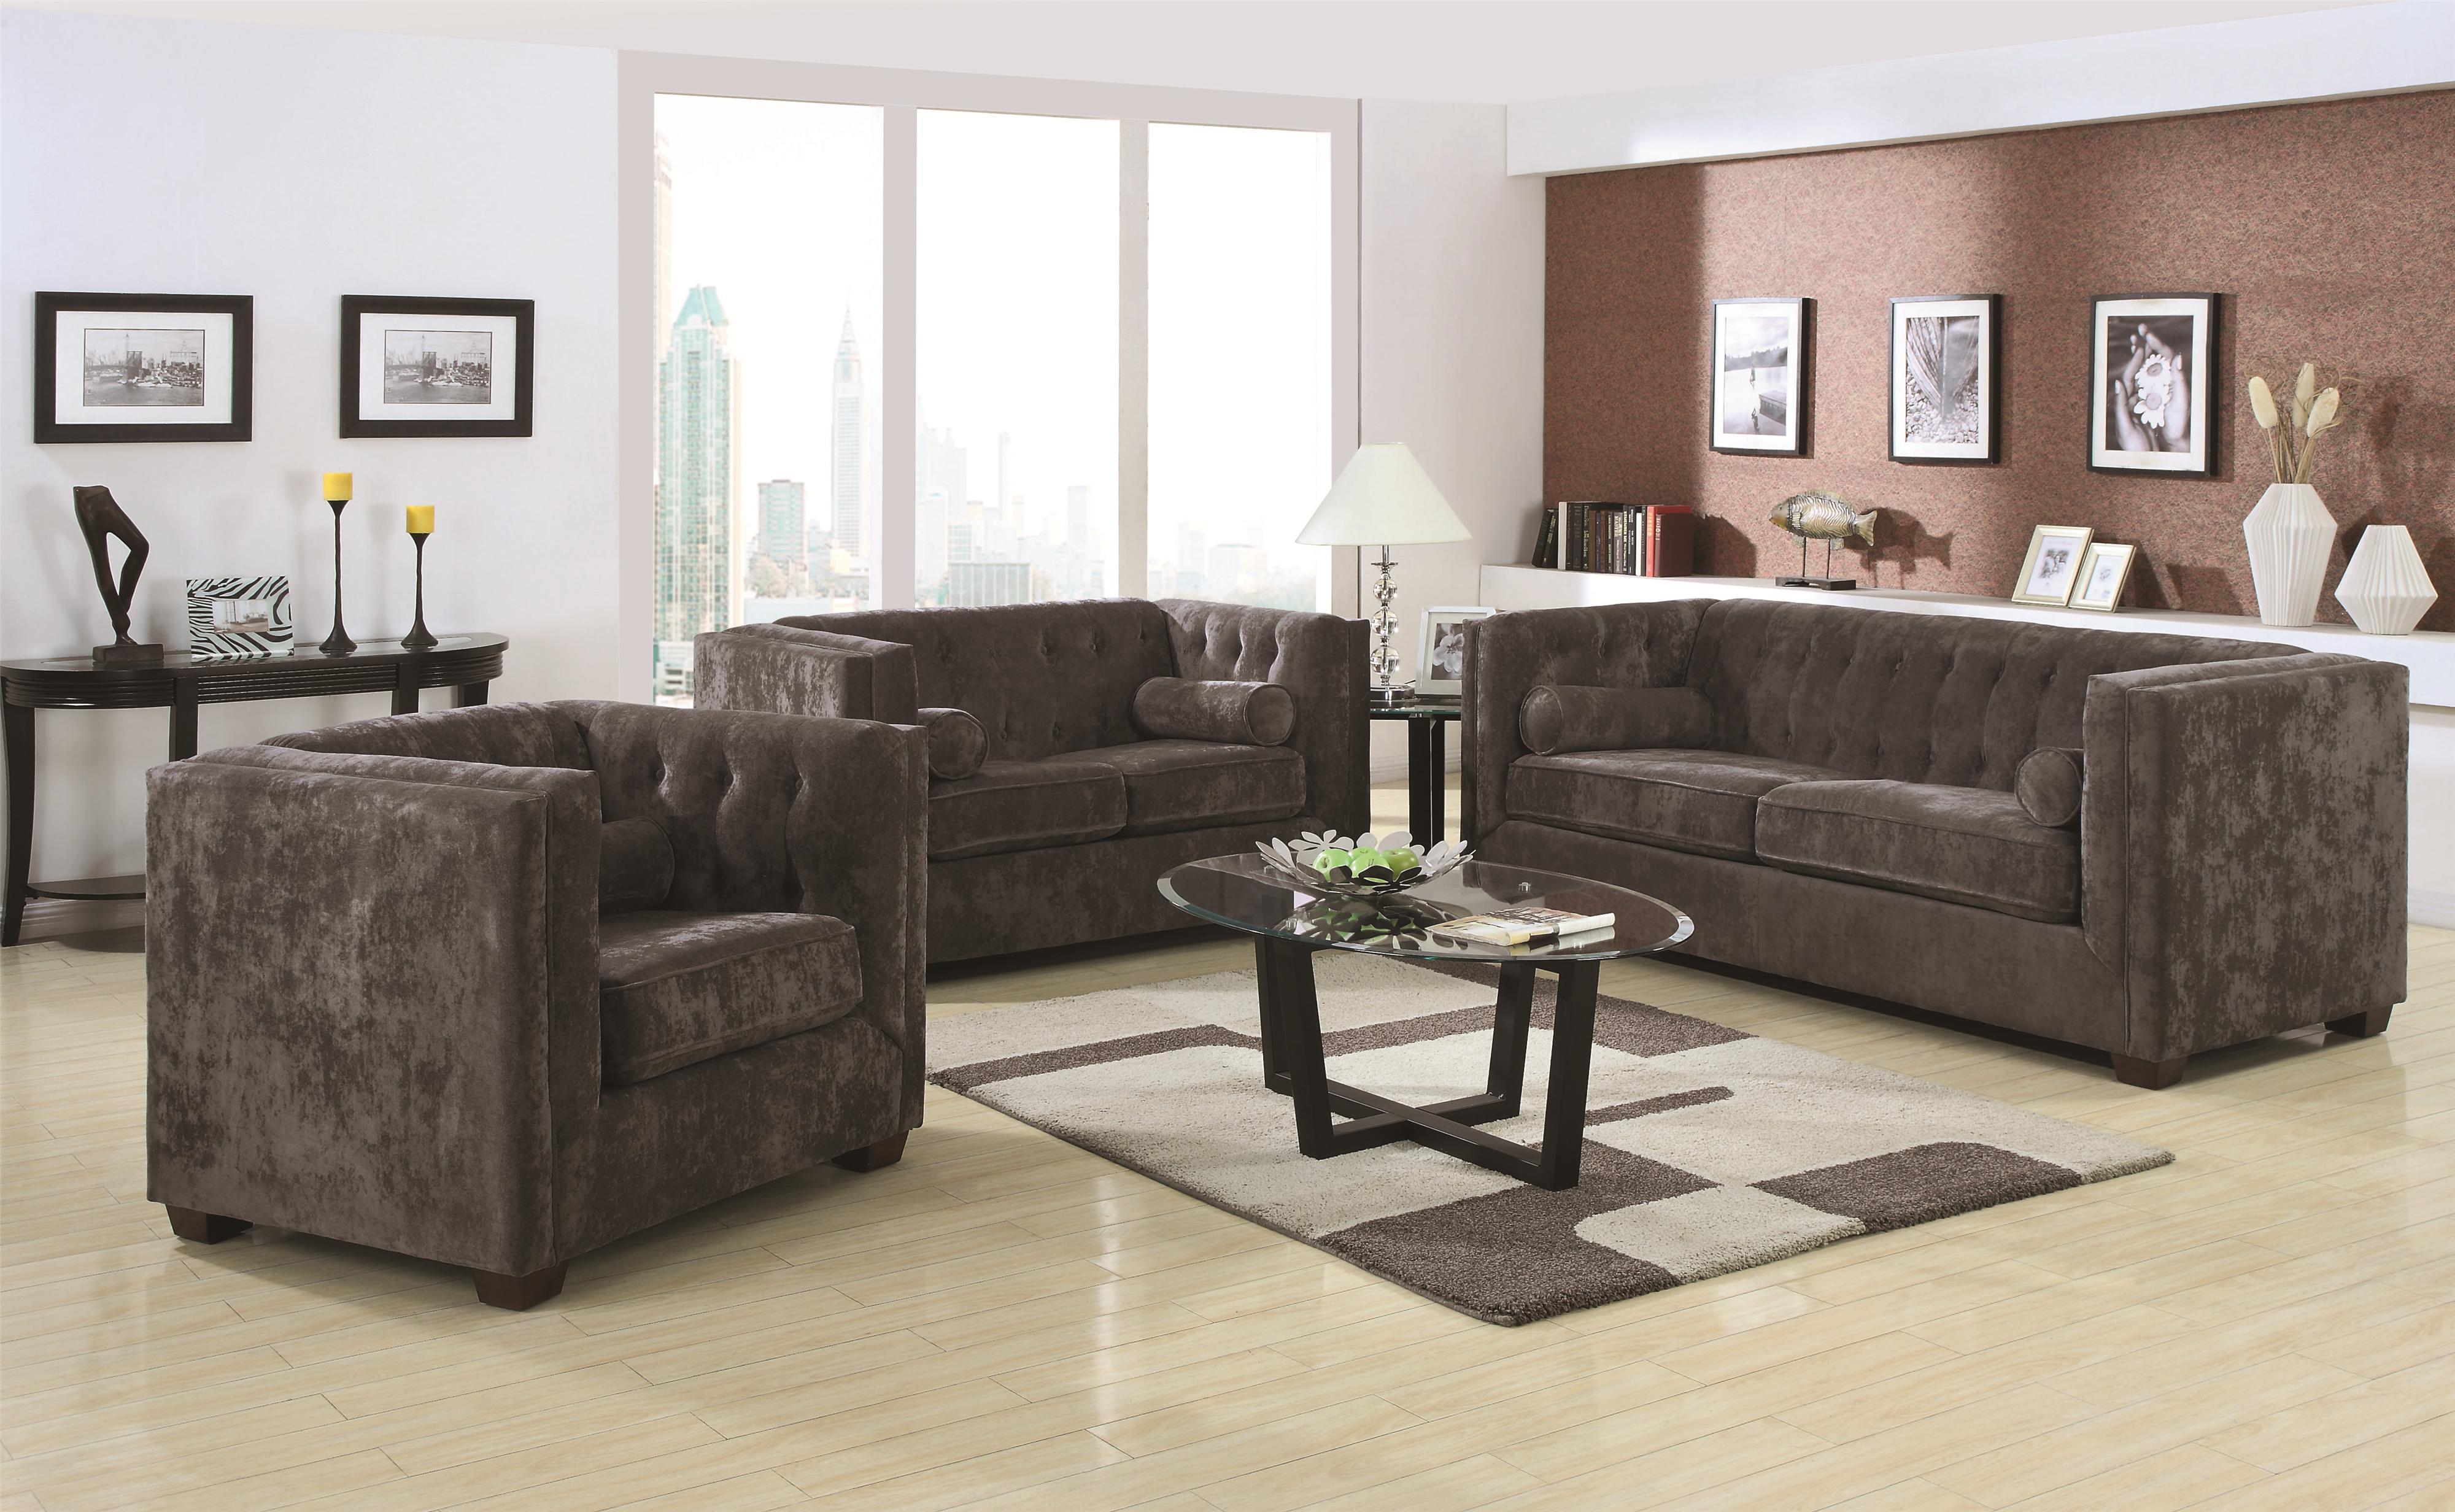 Coaster alexis sofa loveseat aim rental for Coaster co of america furniture